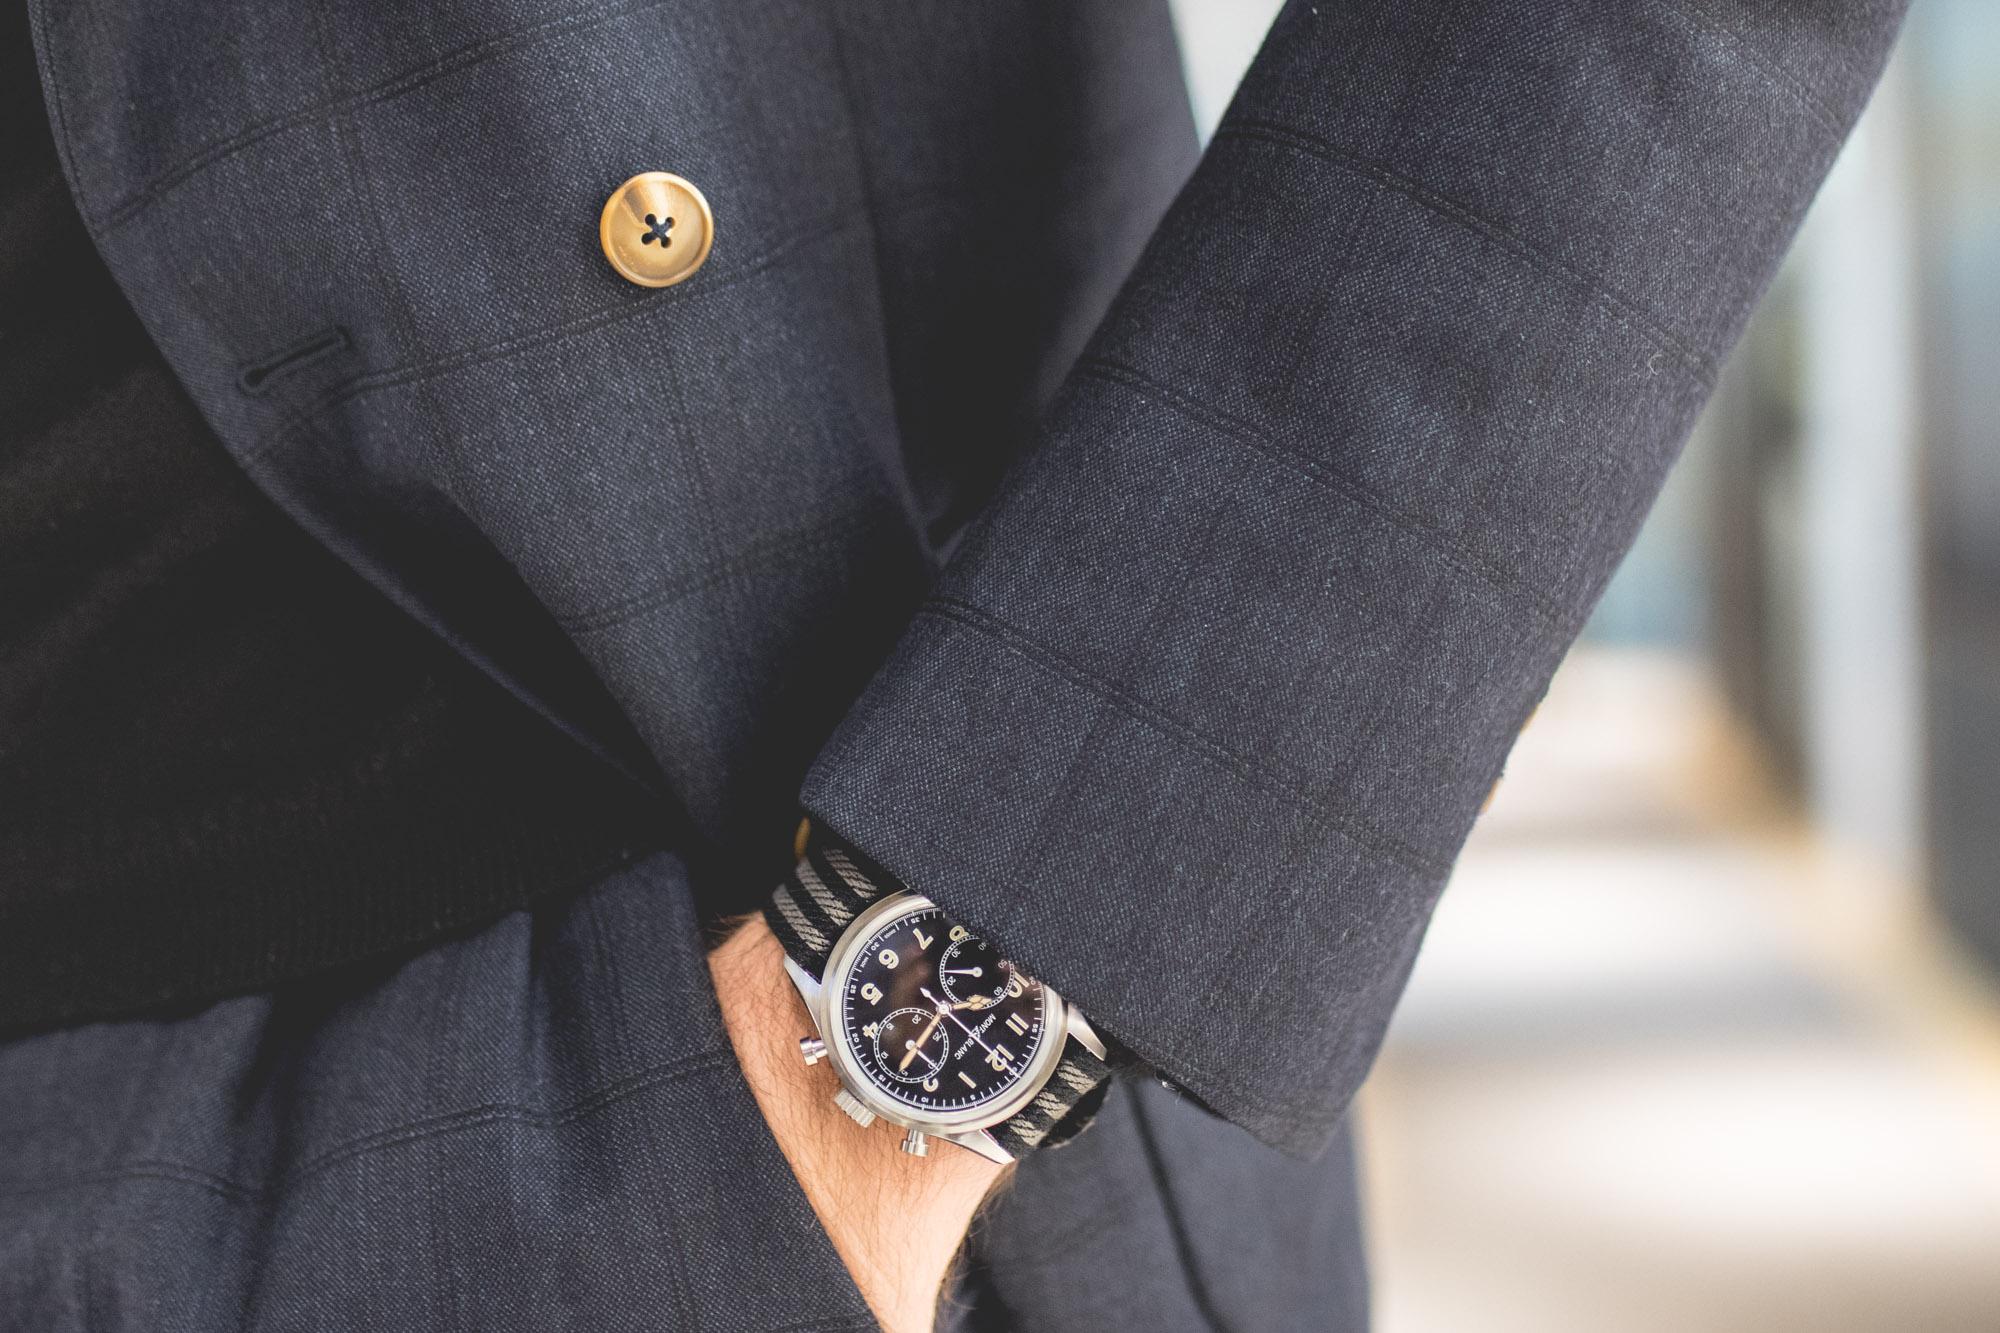 Montblanc SIHH 2018 - 1858 Automatic Chronograph 42mm (Bracelet Nato)